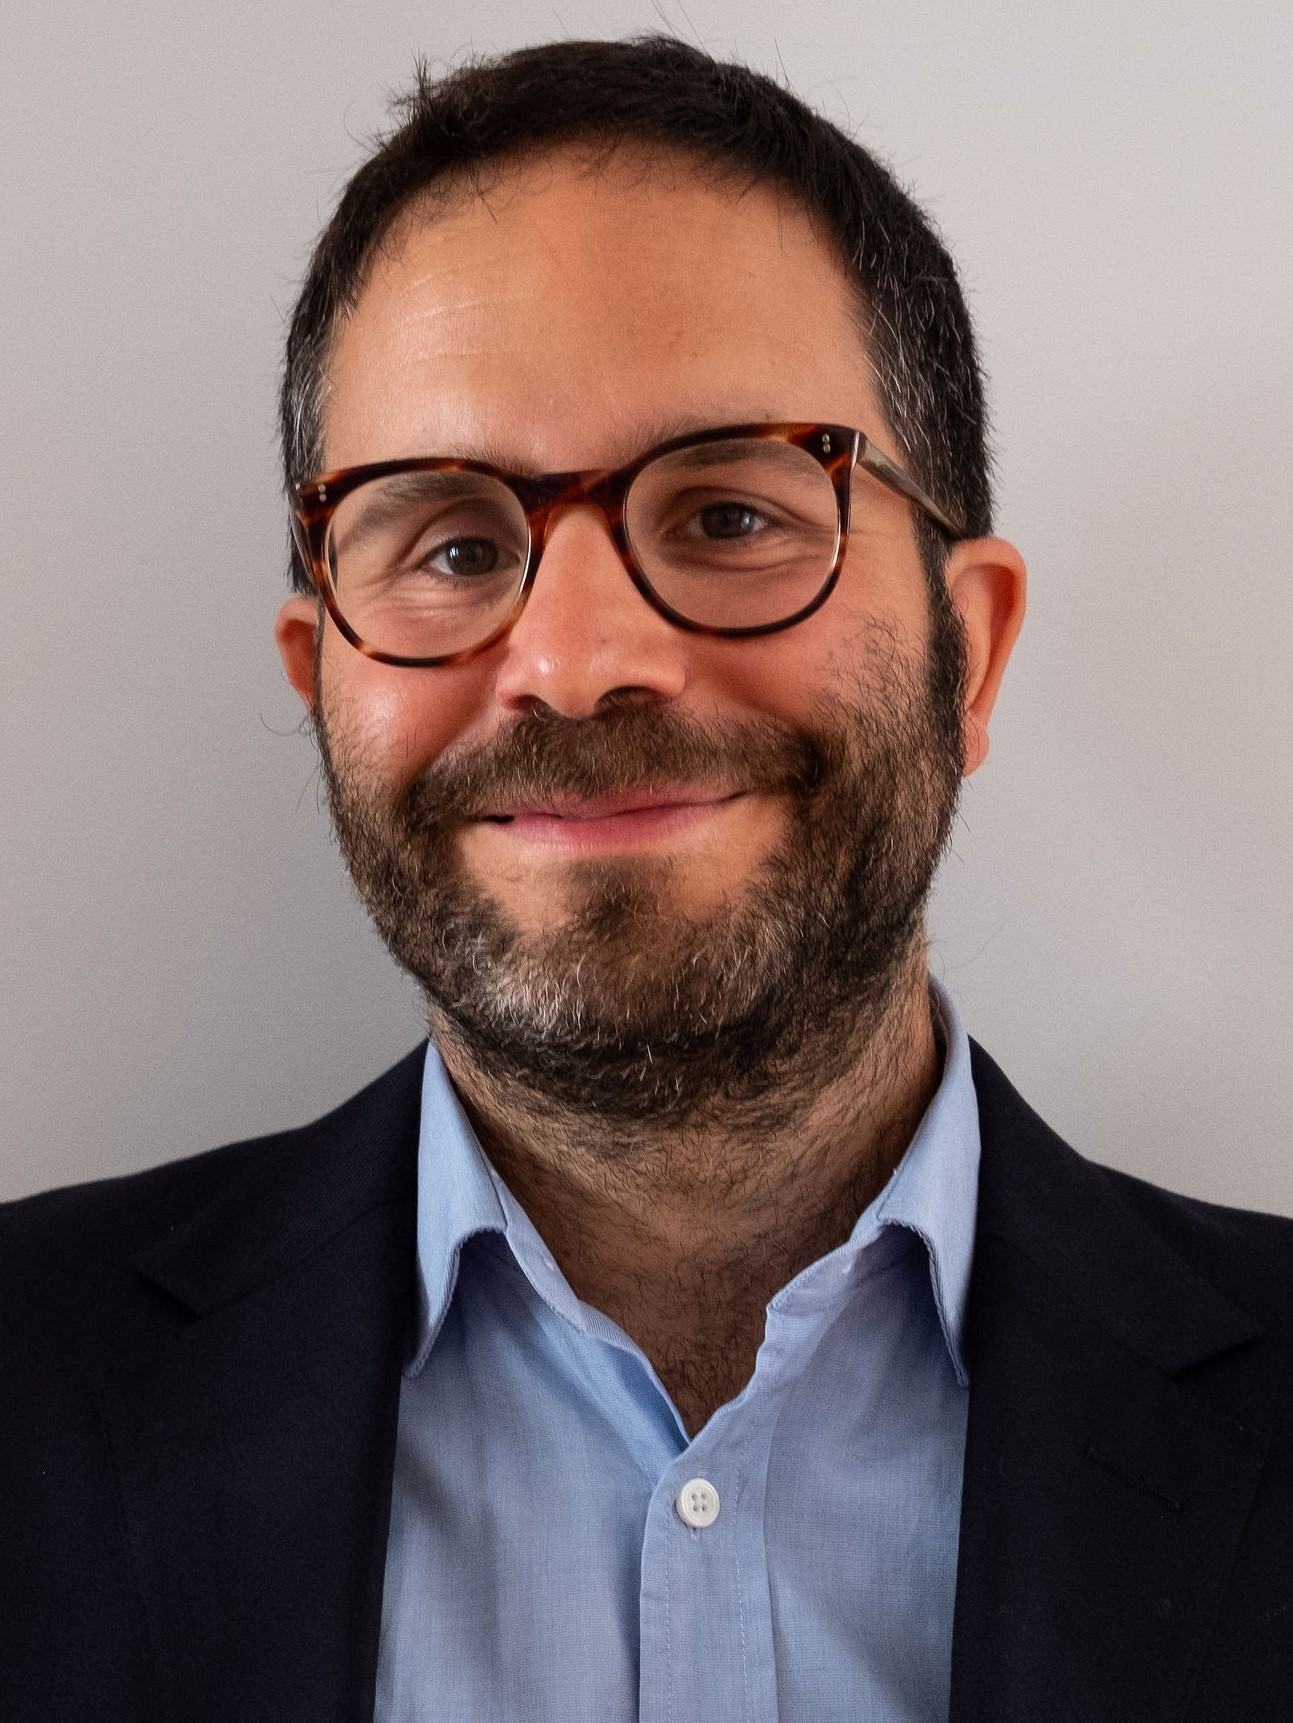 Dr Pablo Garcia Reitboeck